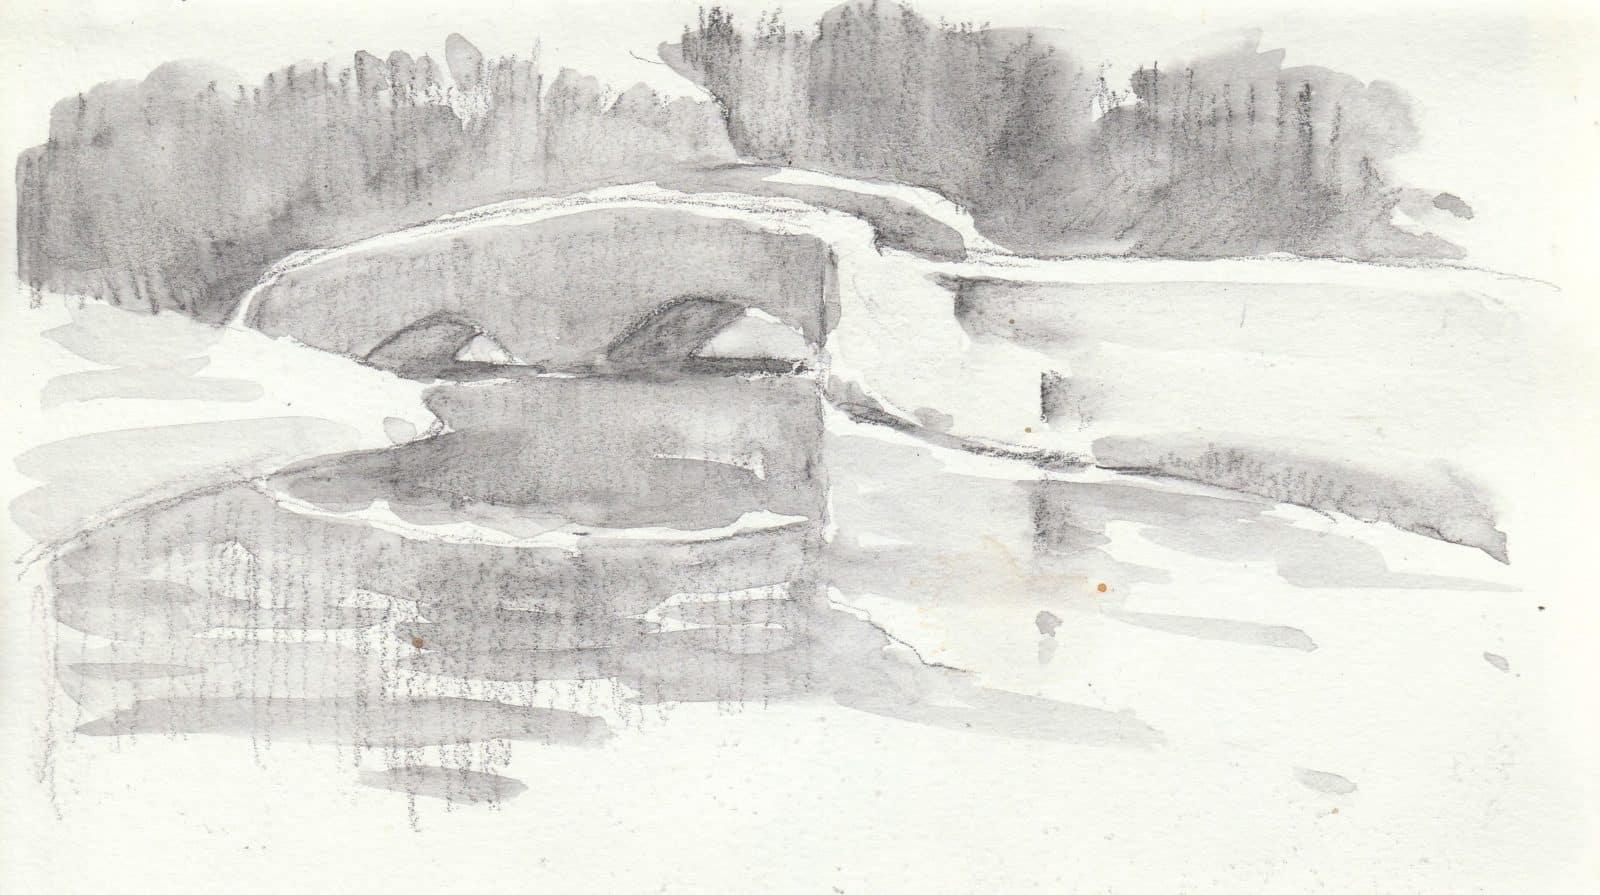 Watercolour Sketchbook by David Webb